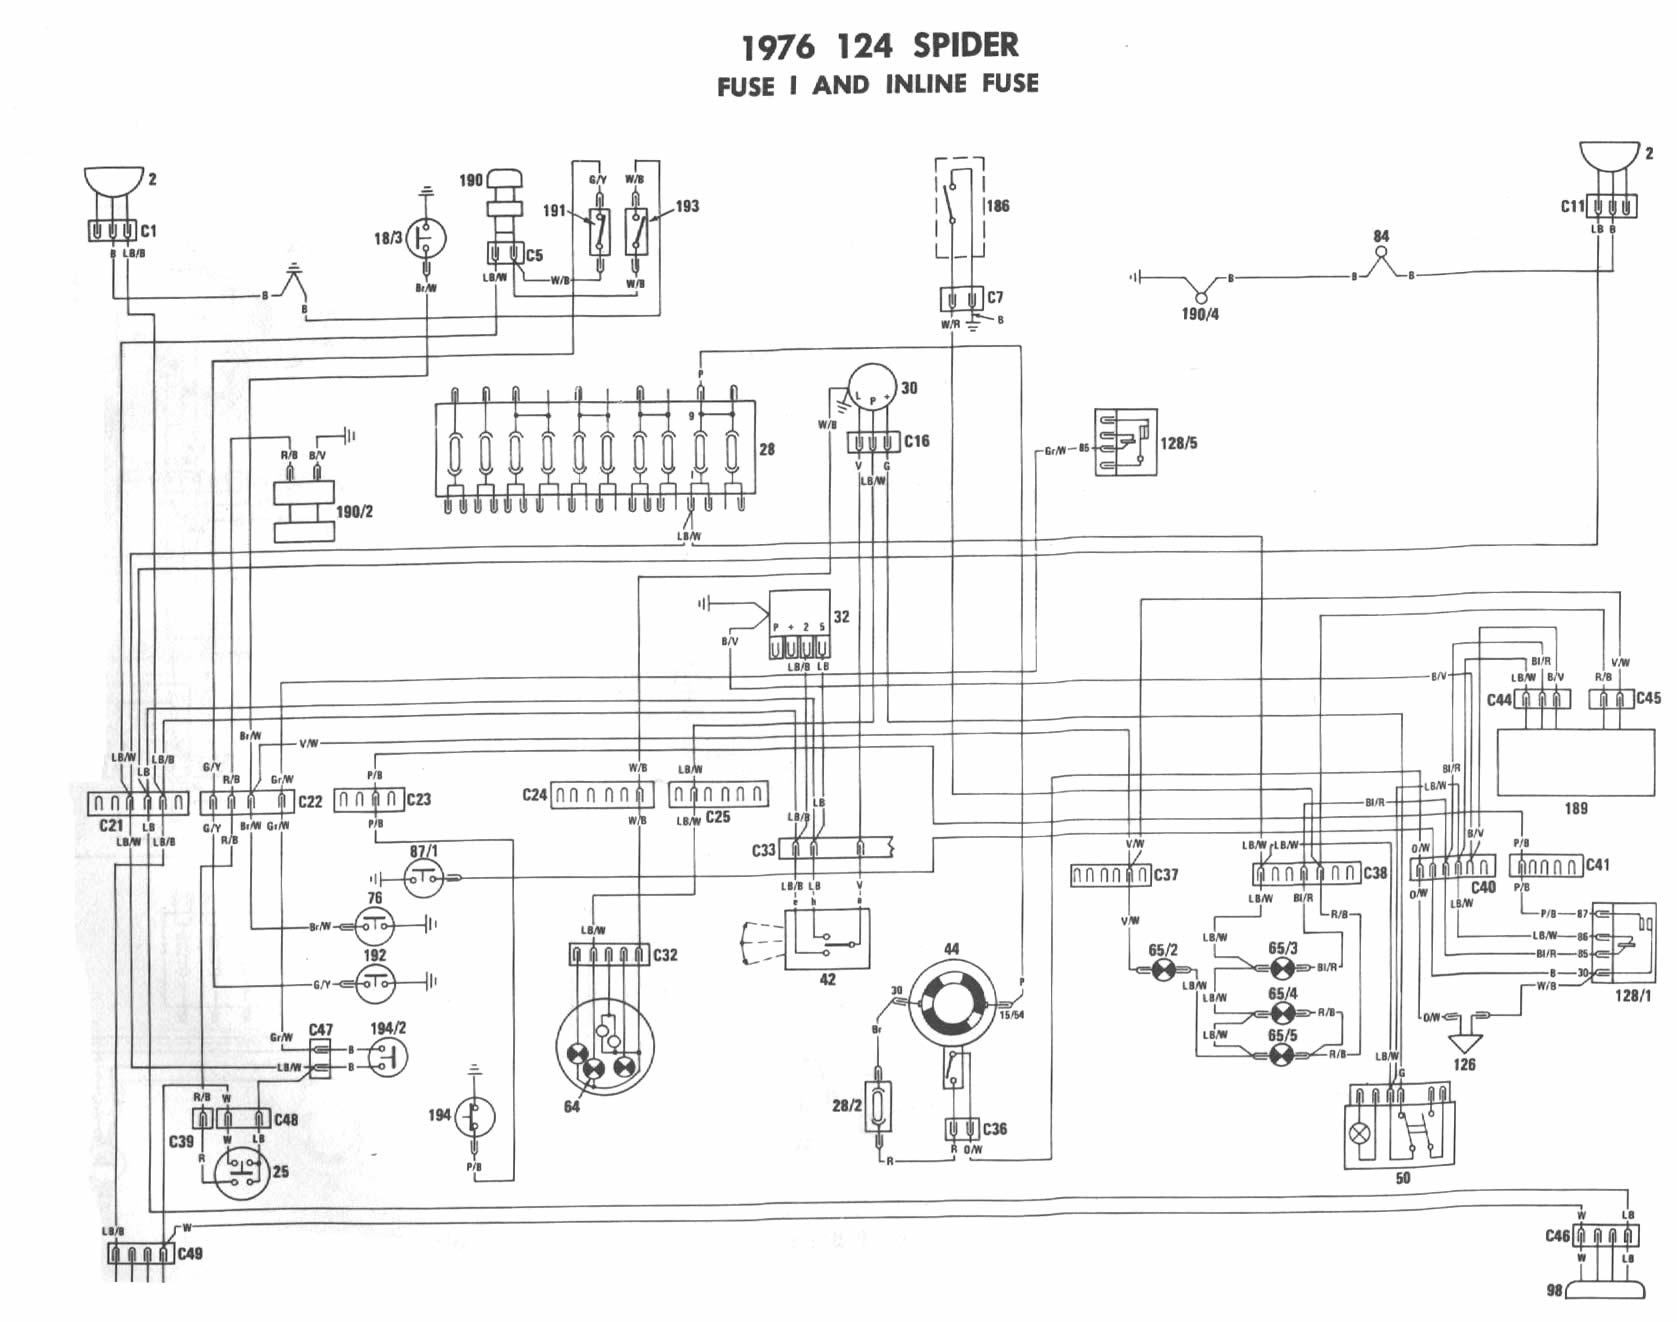 2000 mercury grand marquis wiring diagram 2006 chrysler sebring my